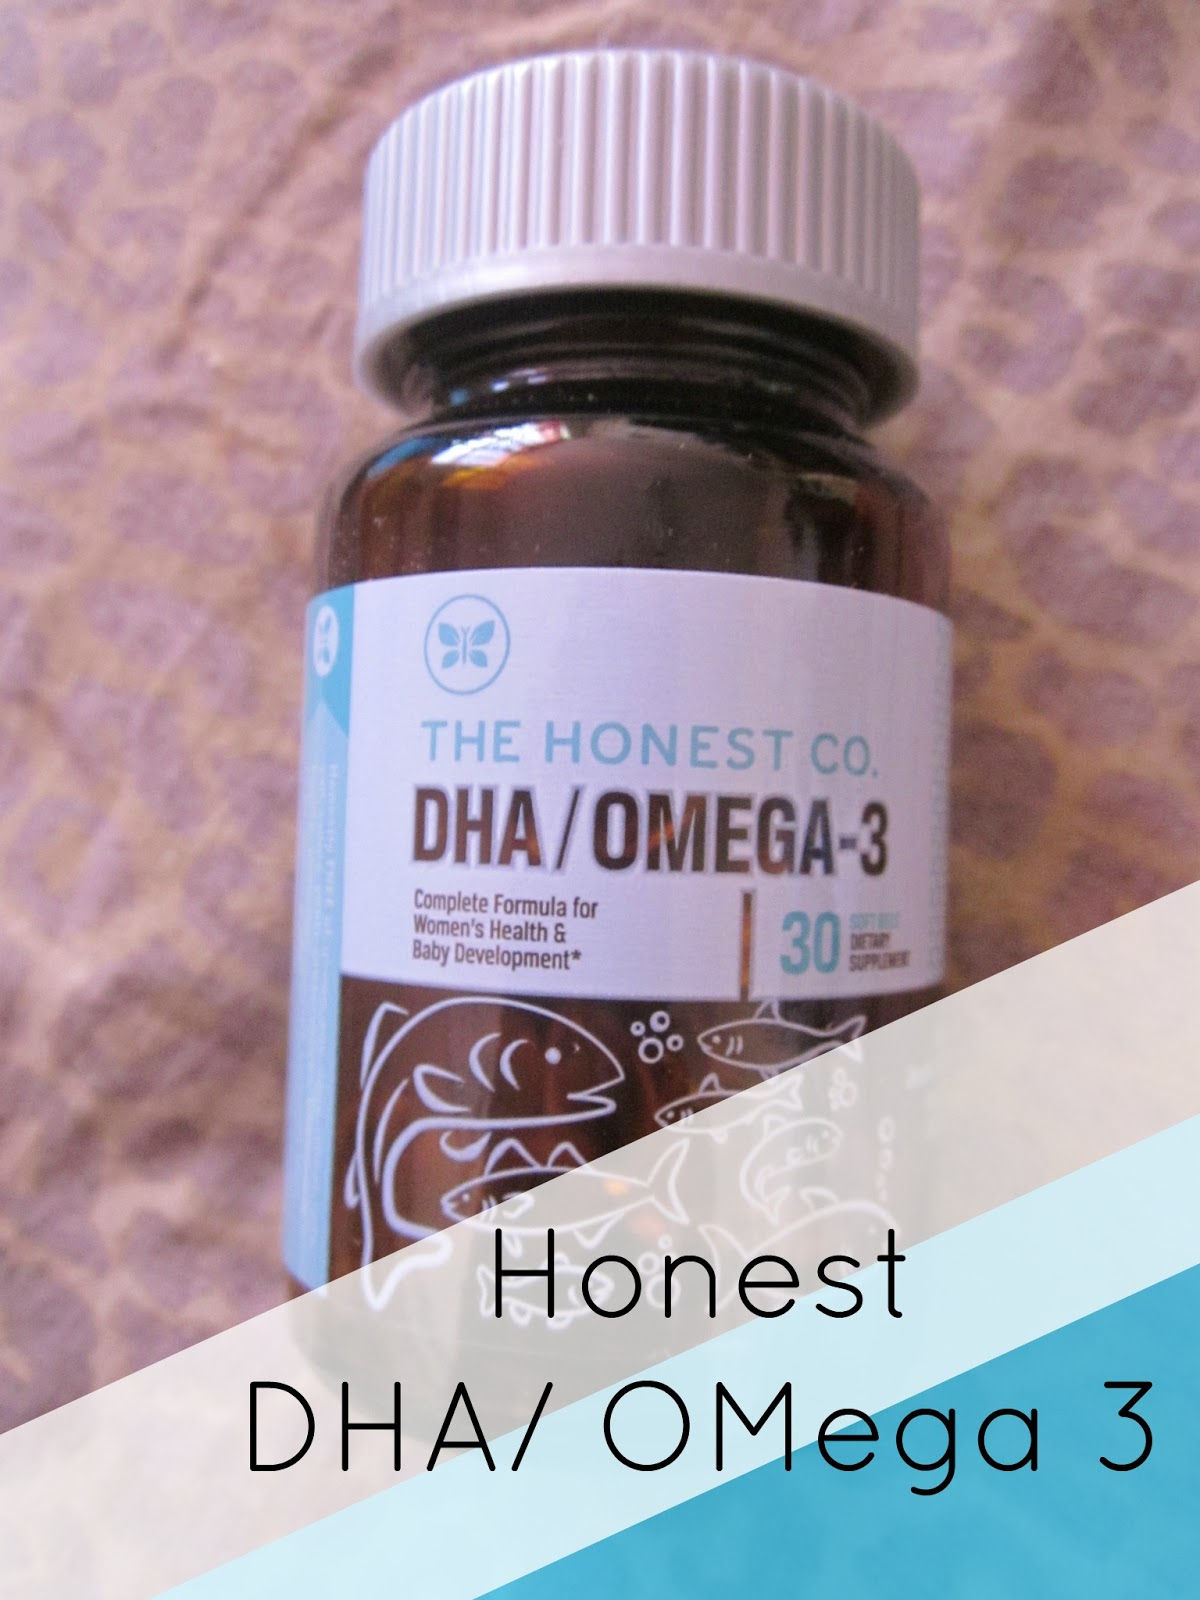 The honest company dha omega 3